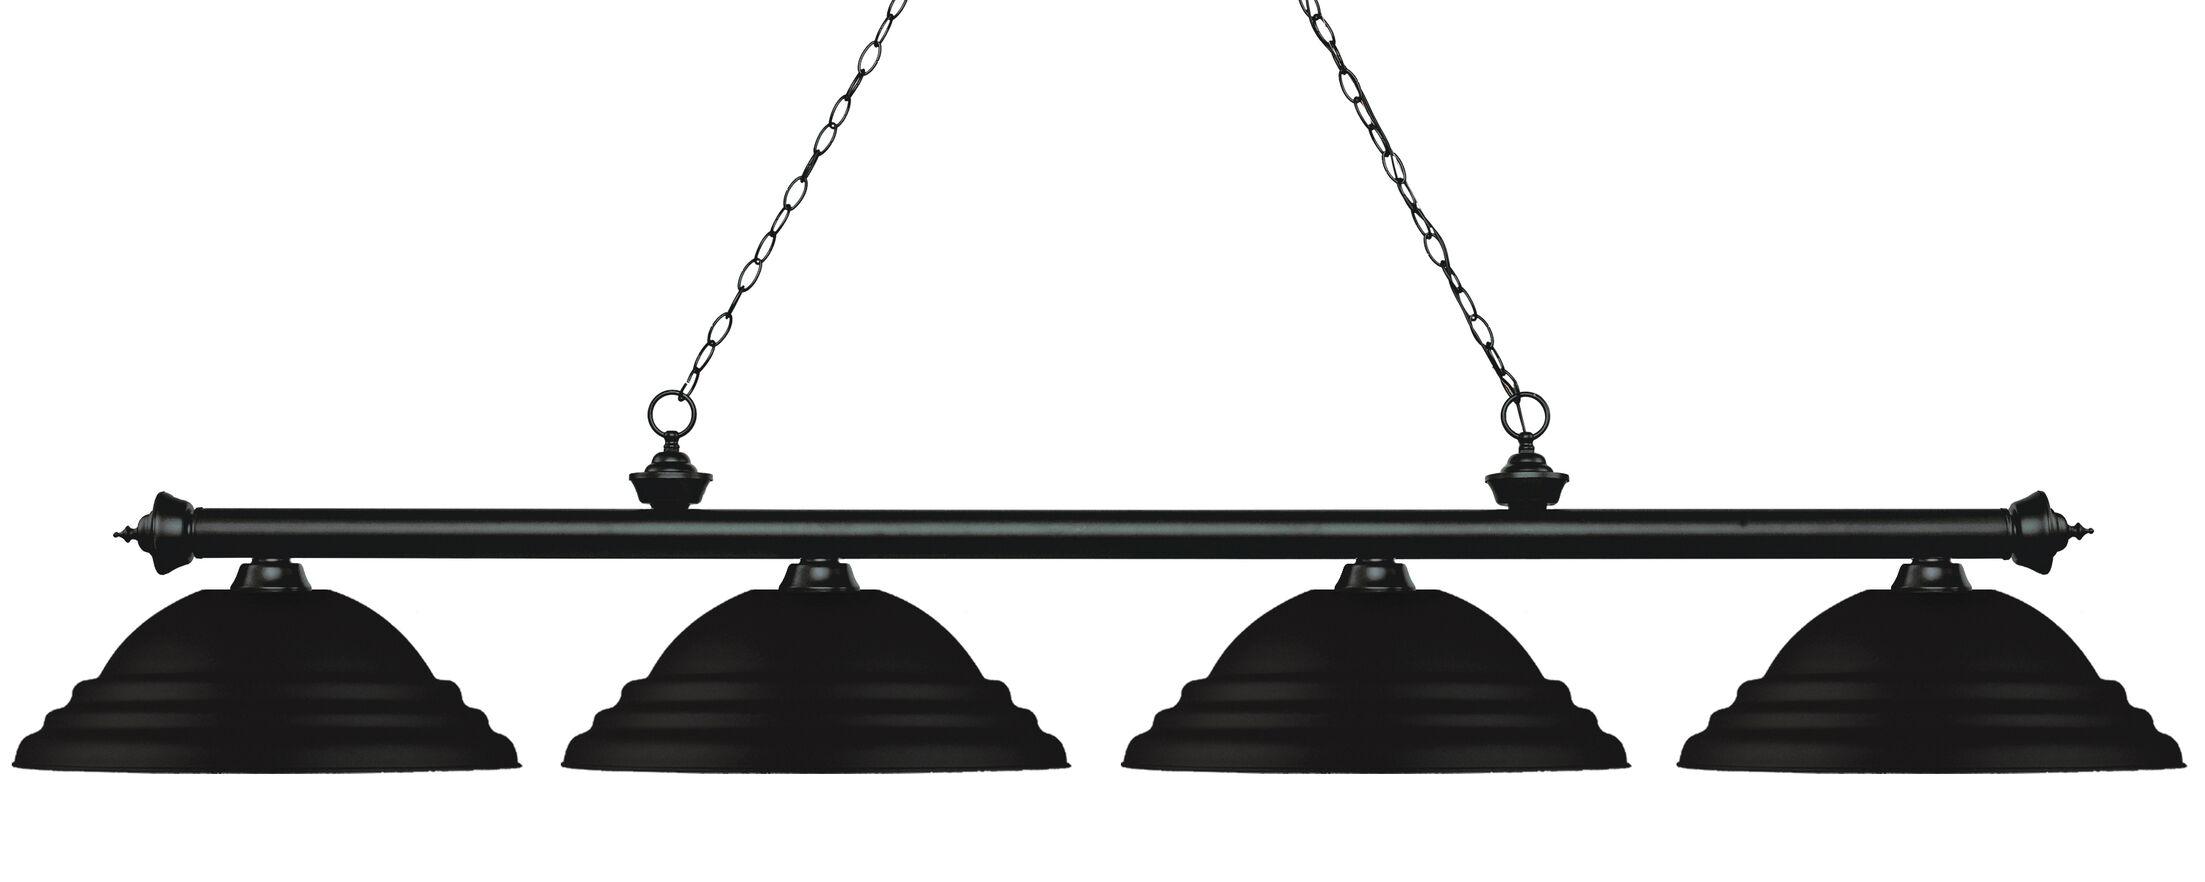 Zephyr 4-Light Metal Shade Billiard Light Shade Color: Matte Black, Finish: Matte Black